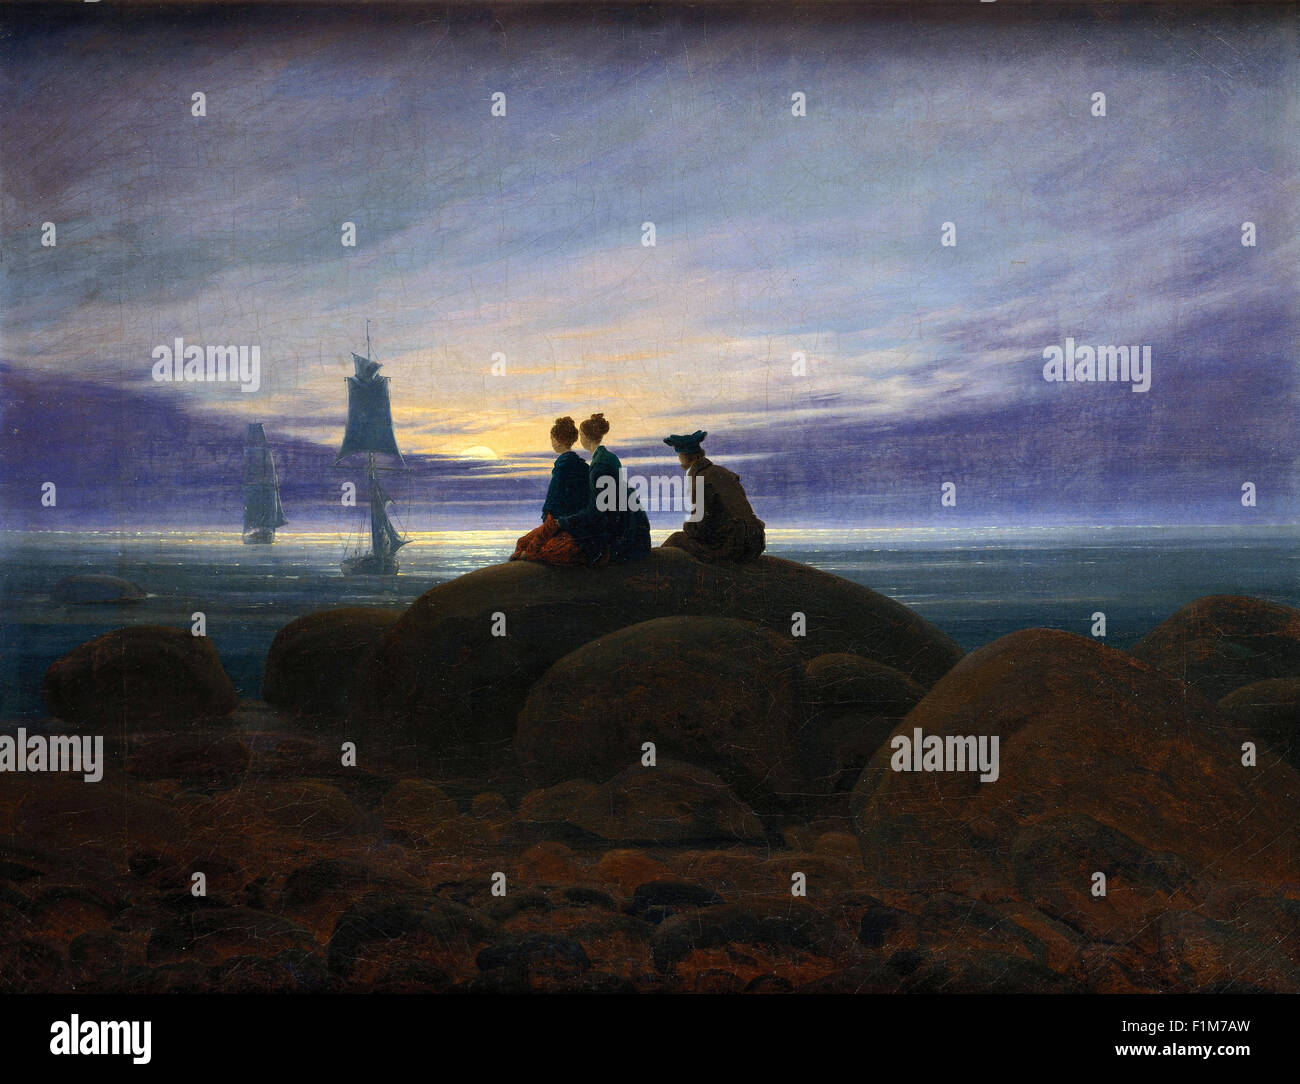 Caspar David Friedrich - Moonrise over the Sea - Stock Image